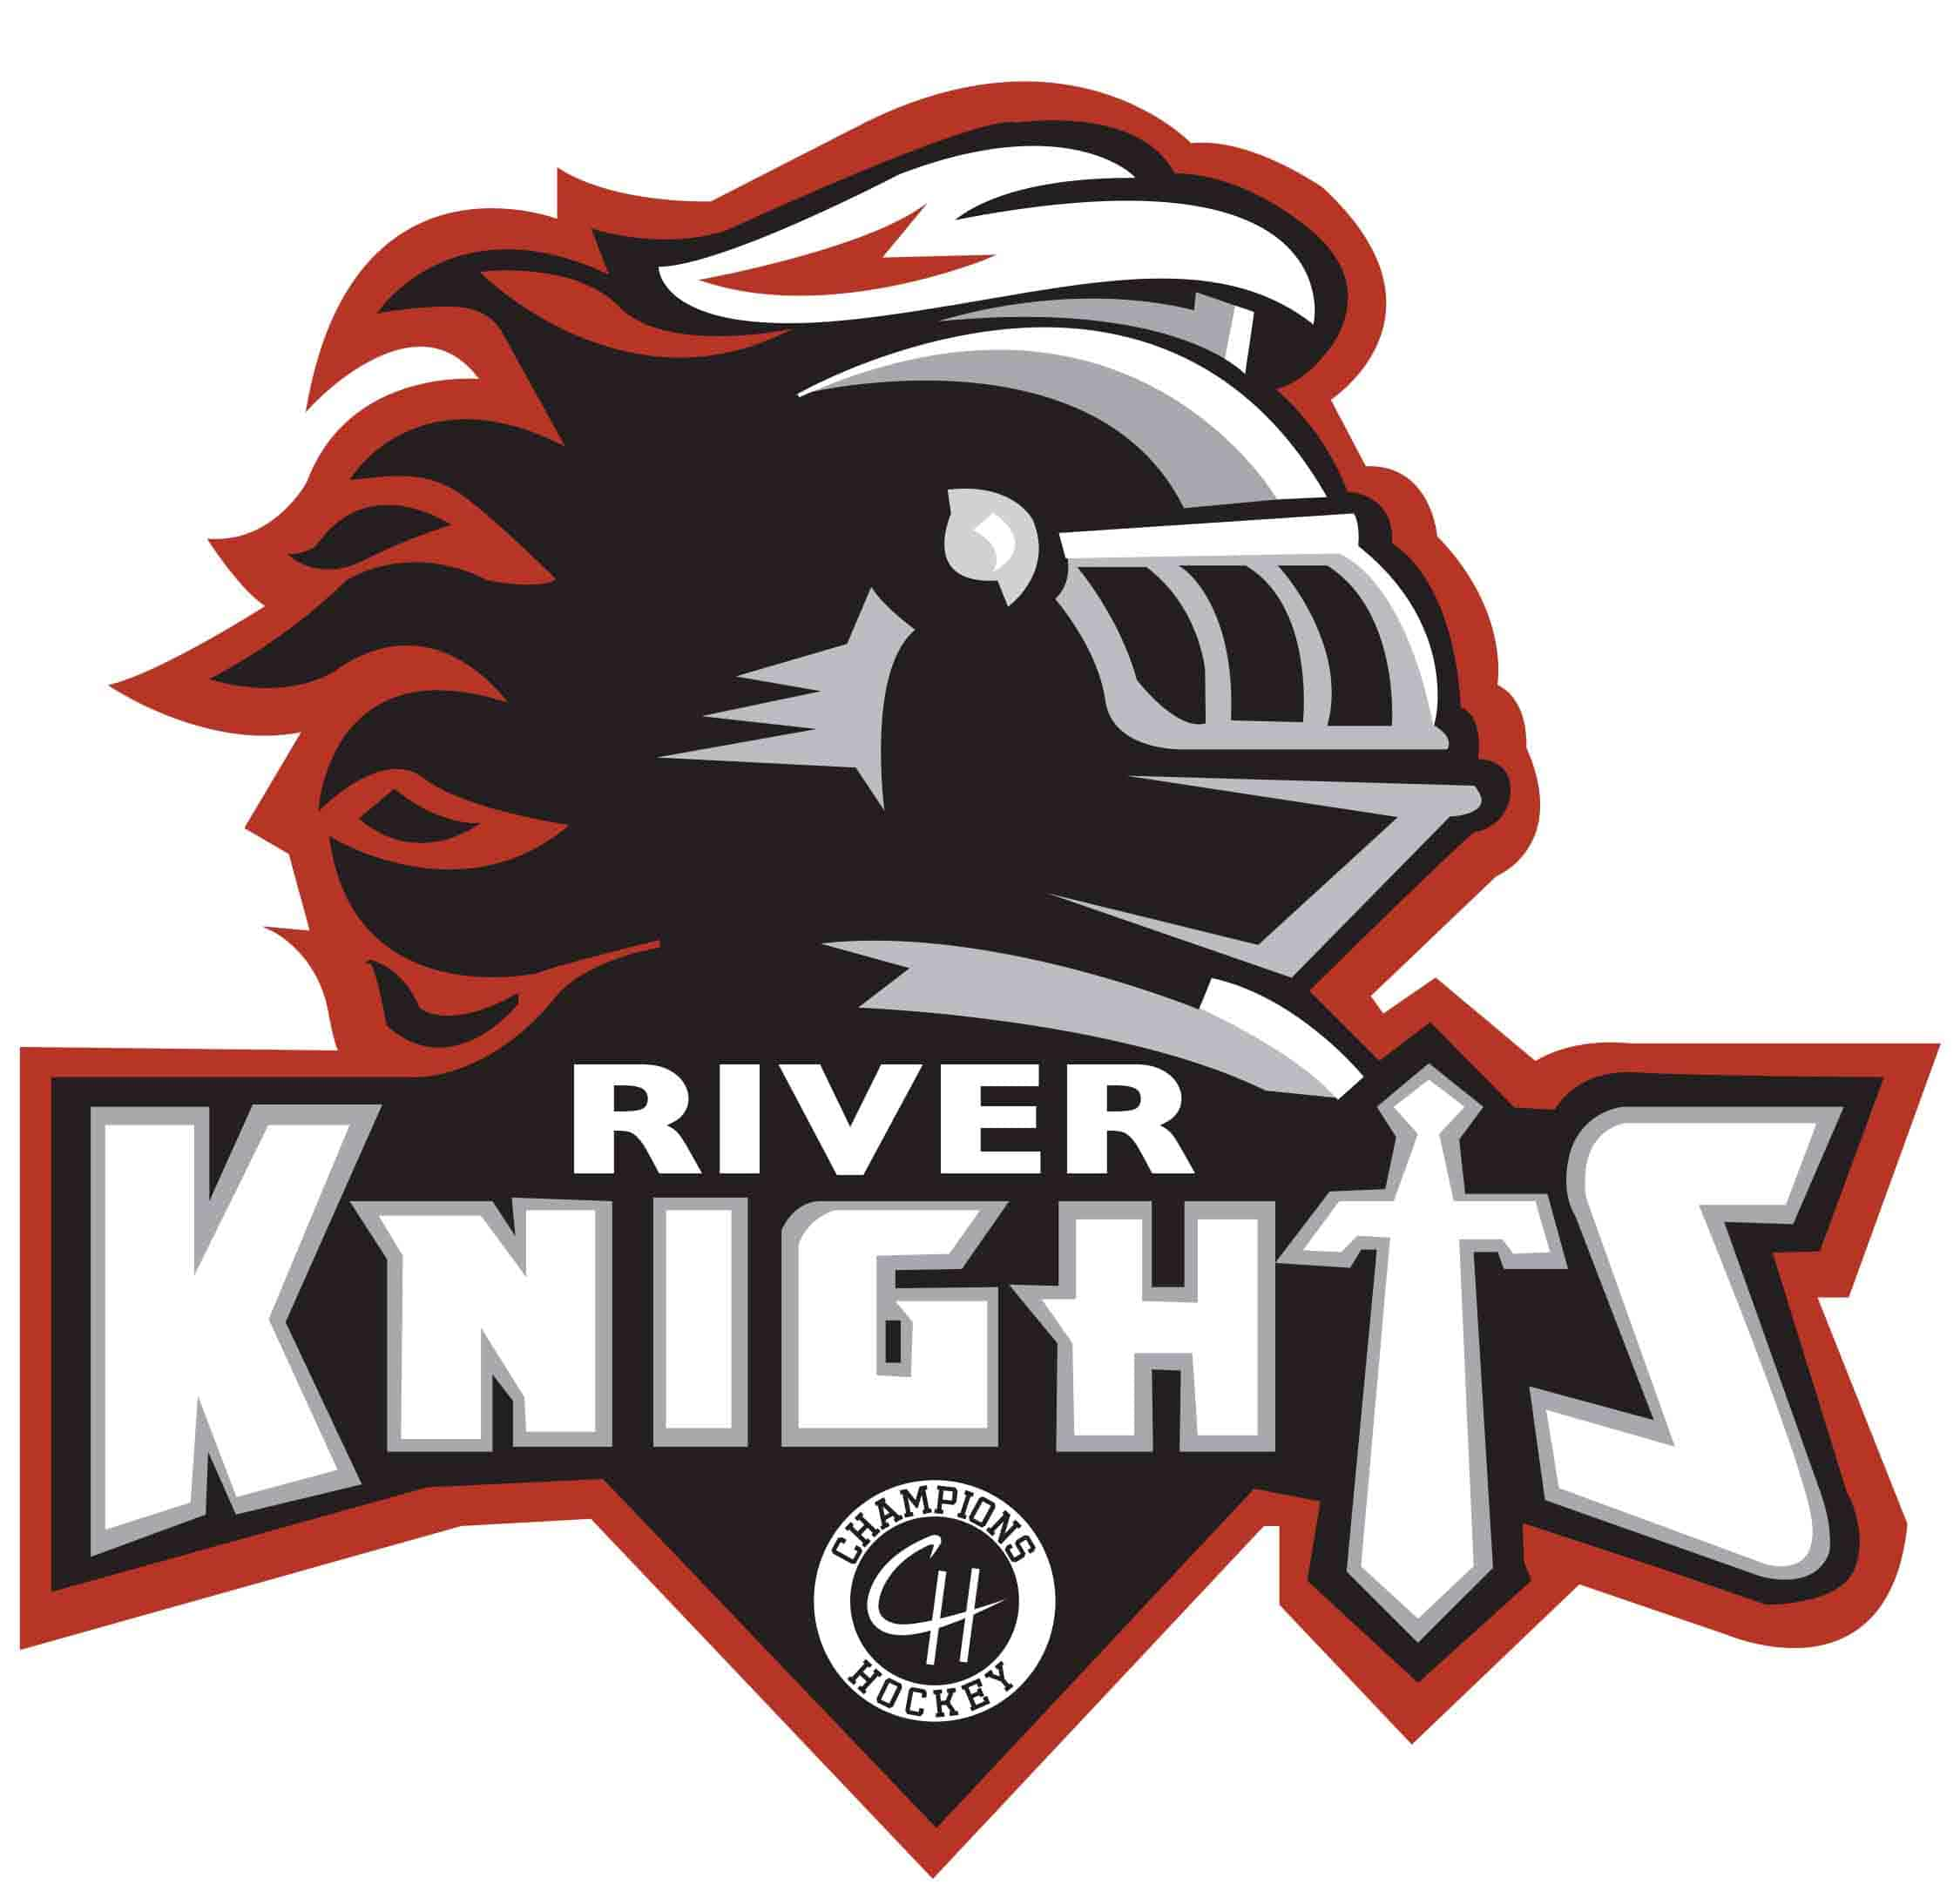 Champions River Knights